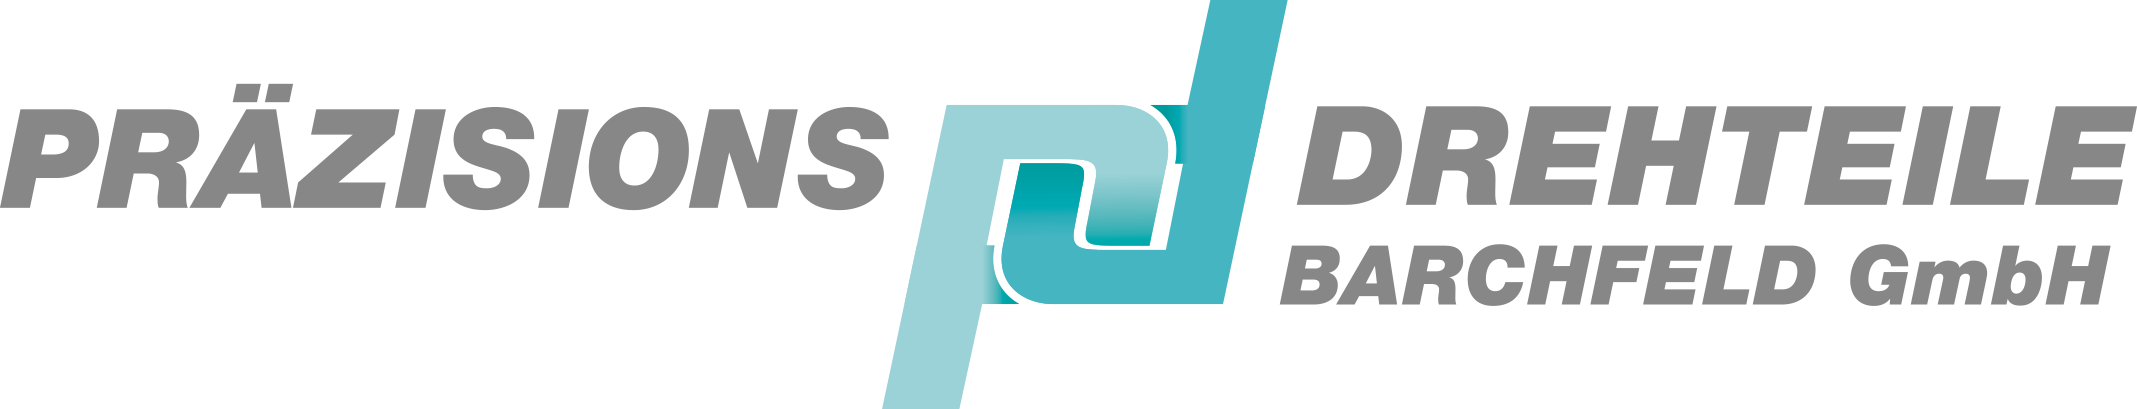 Präzisions-Drehteile Barchfeld GmbH